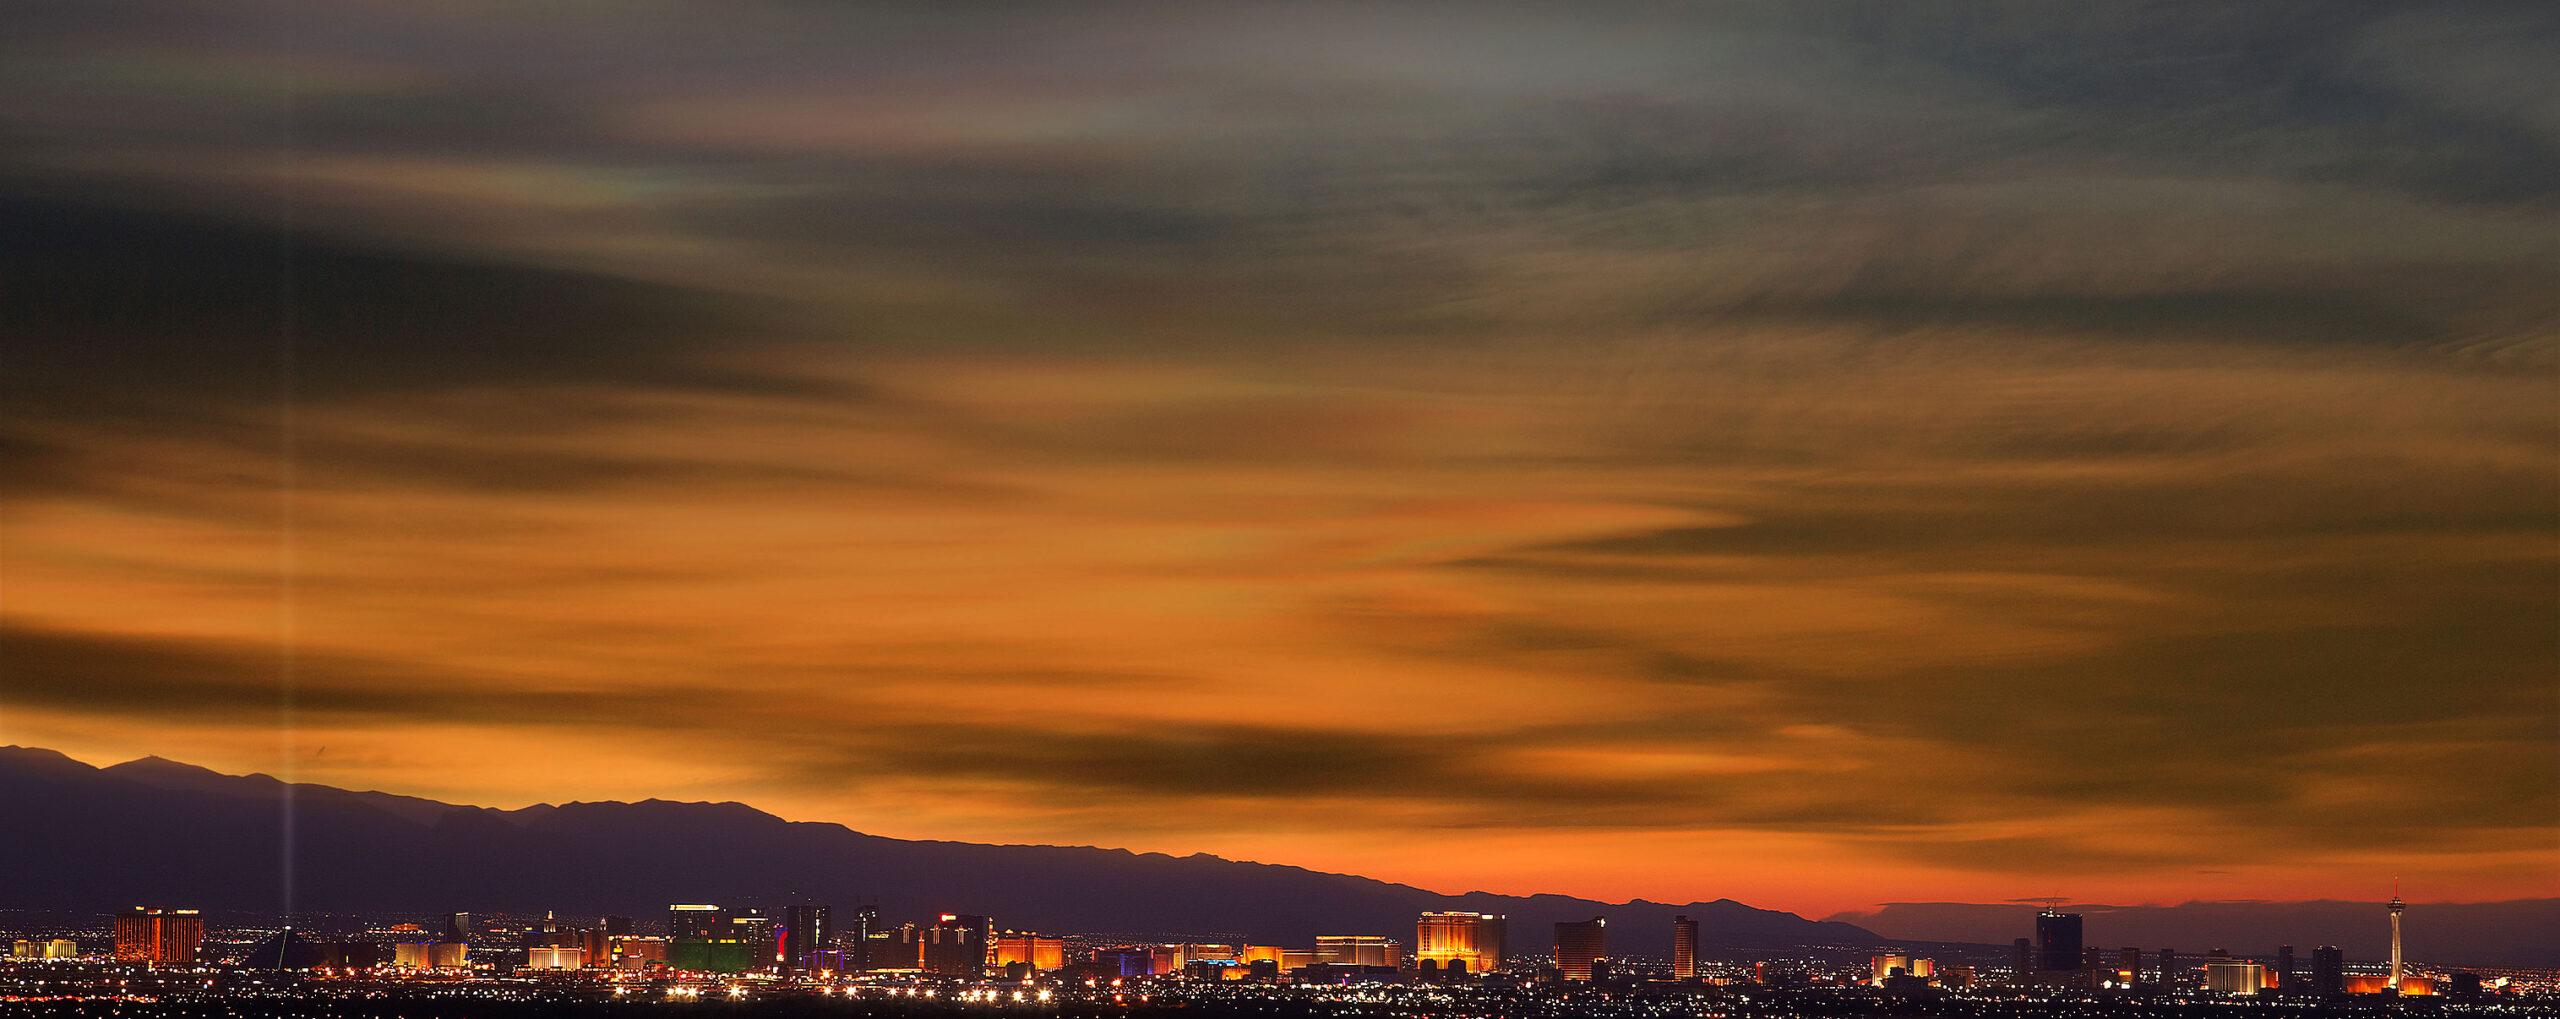 MC Summit Las Vegas December 7-10, 2020